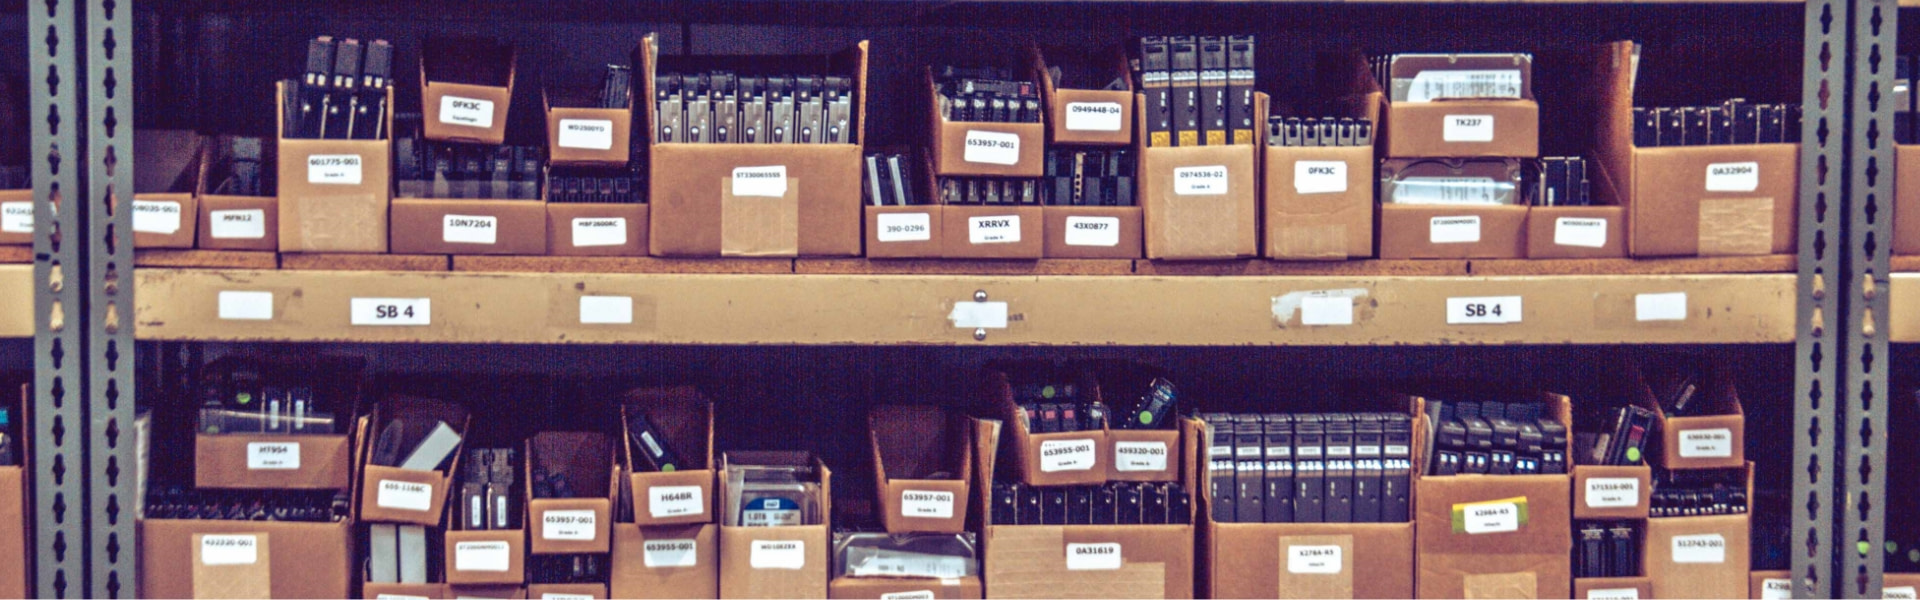 storage-rack-in-warehouse